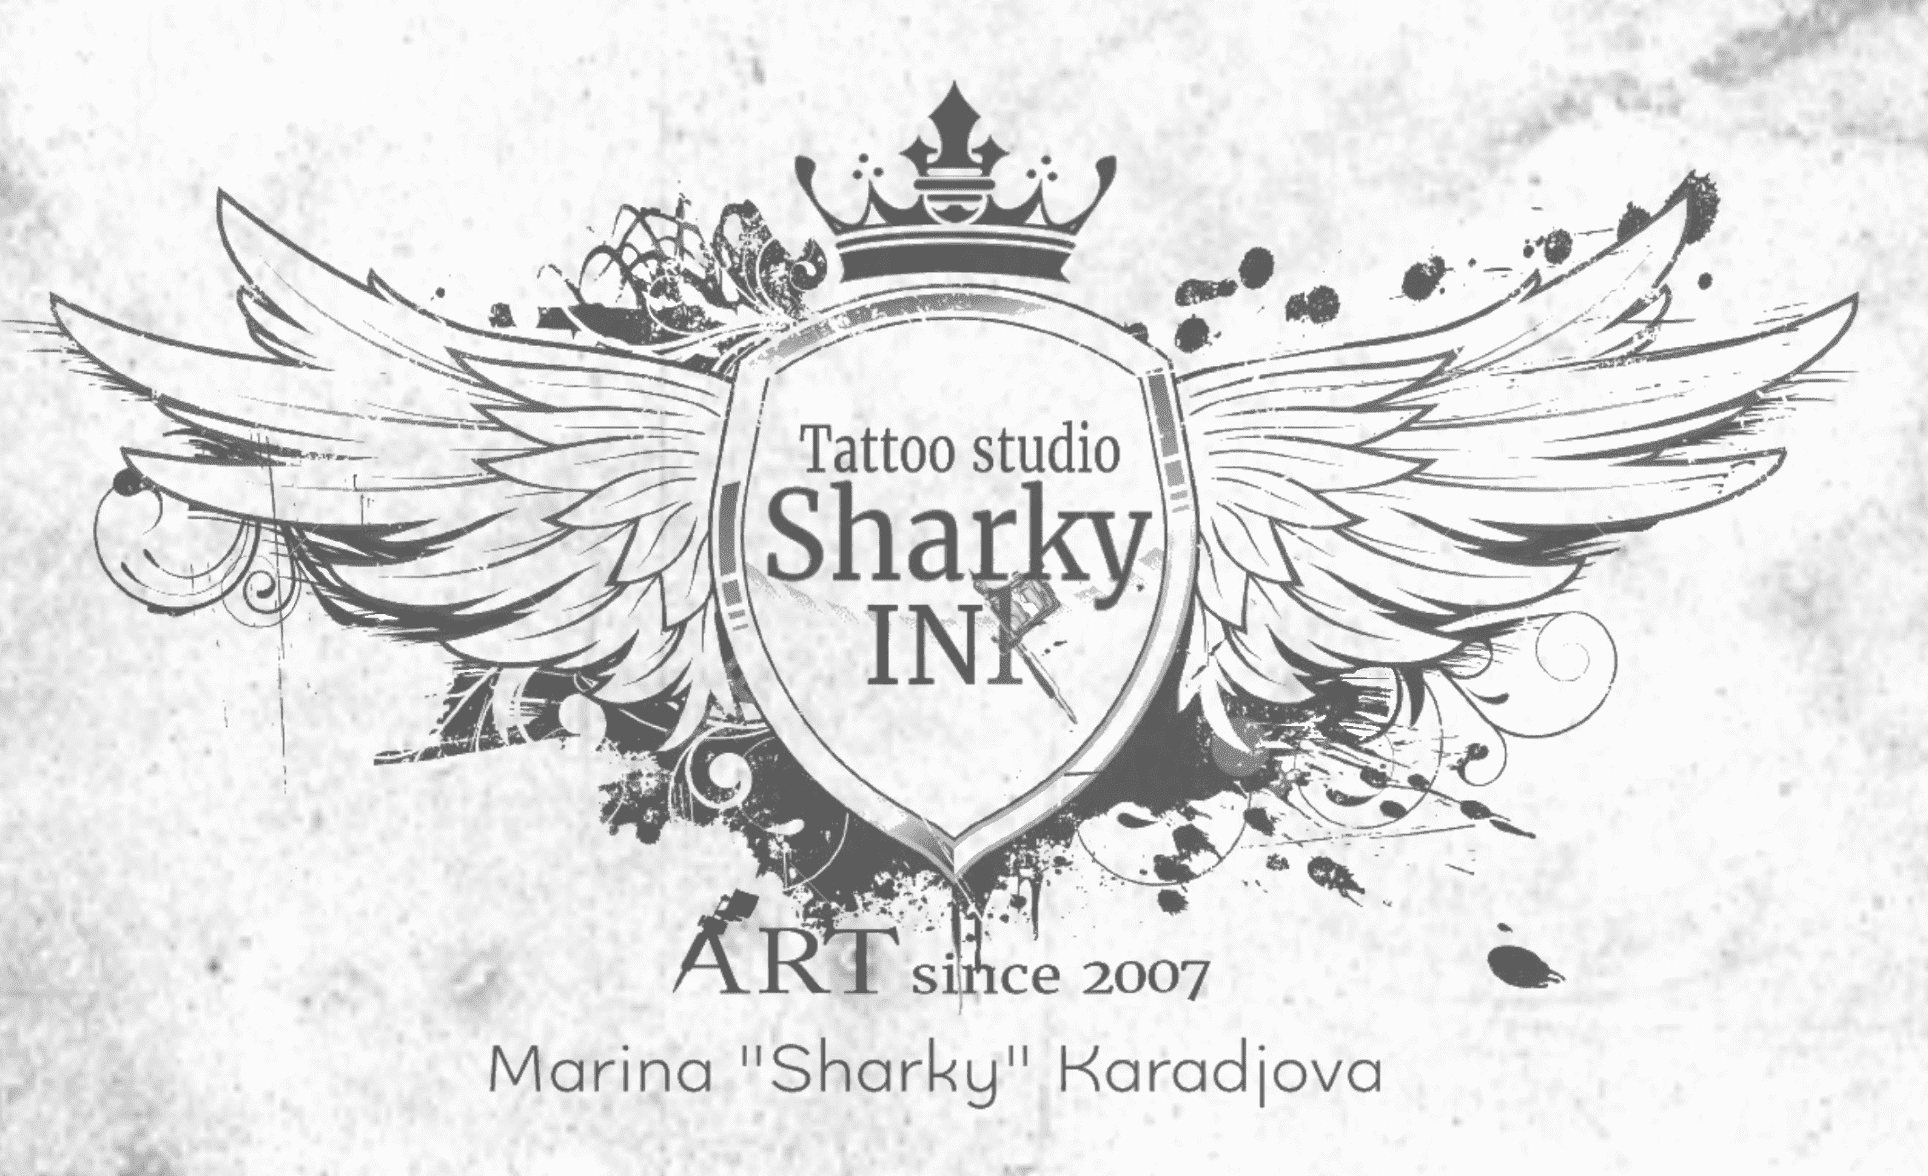 sharkyink.bg